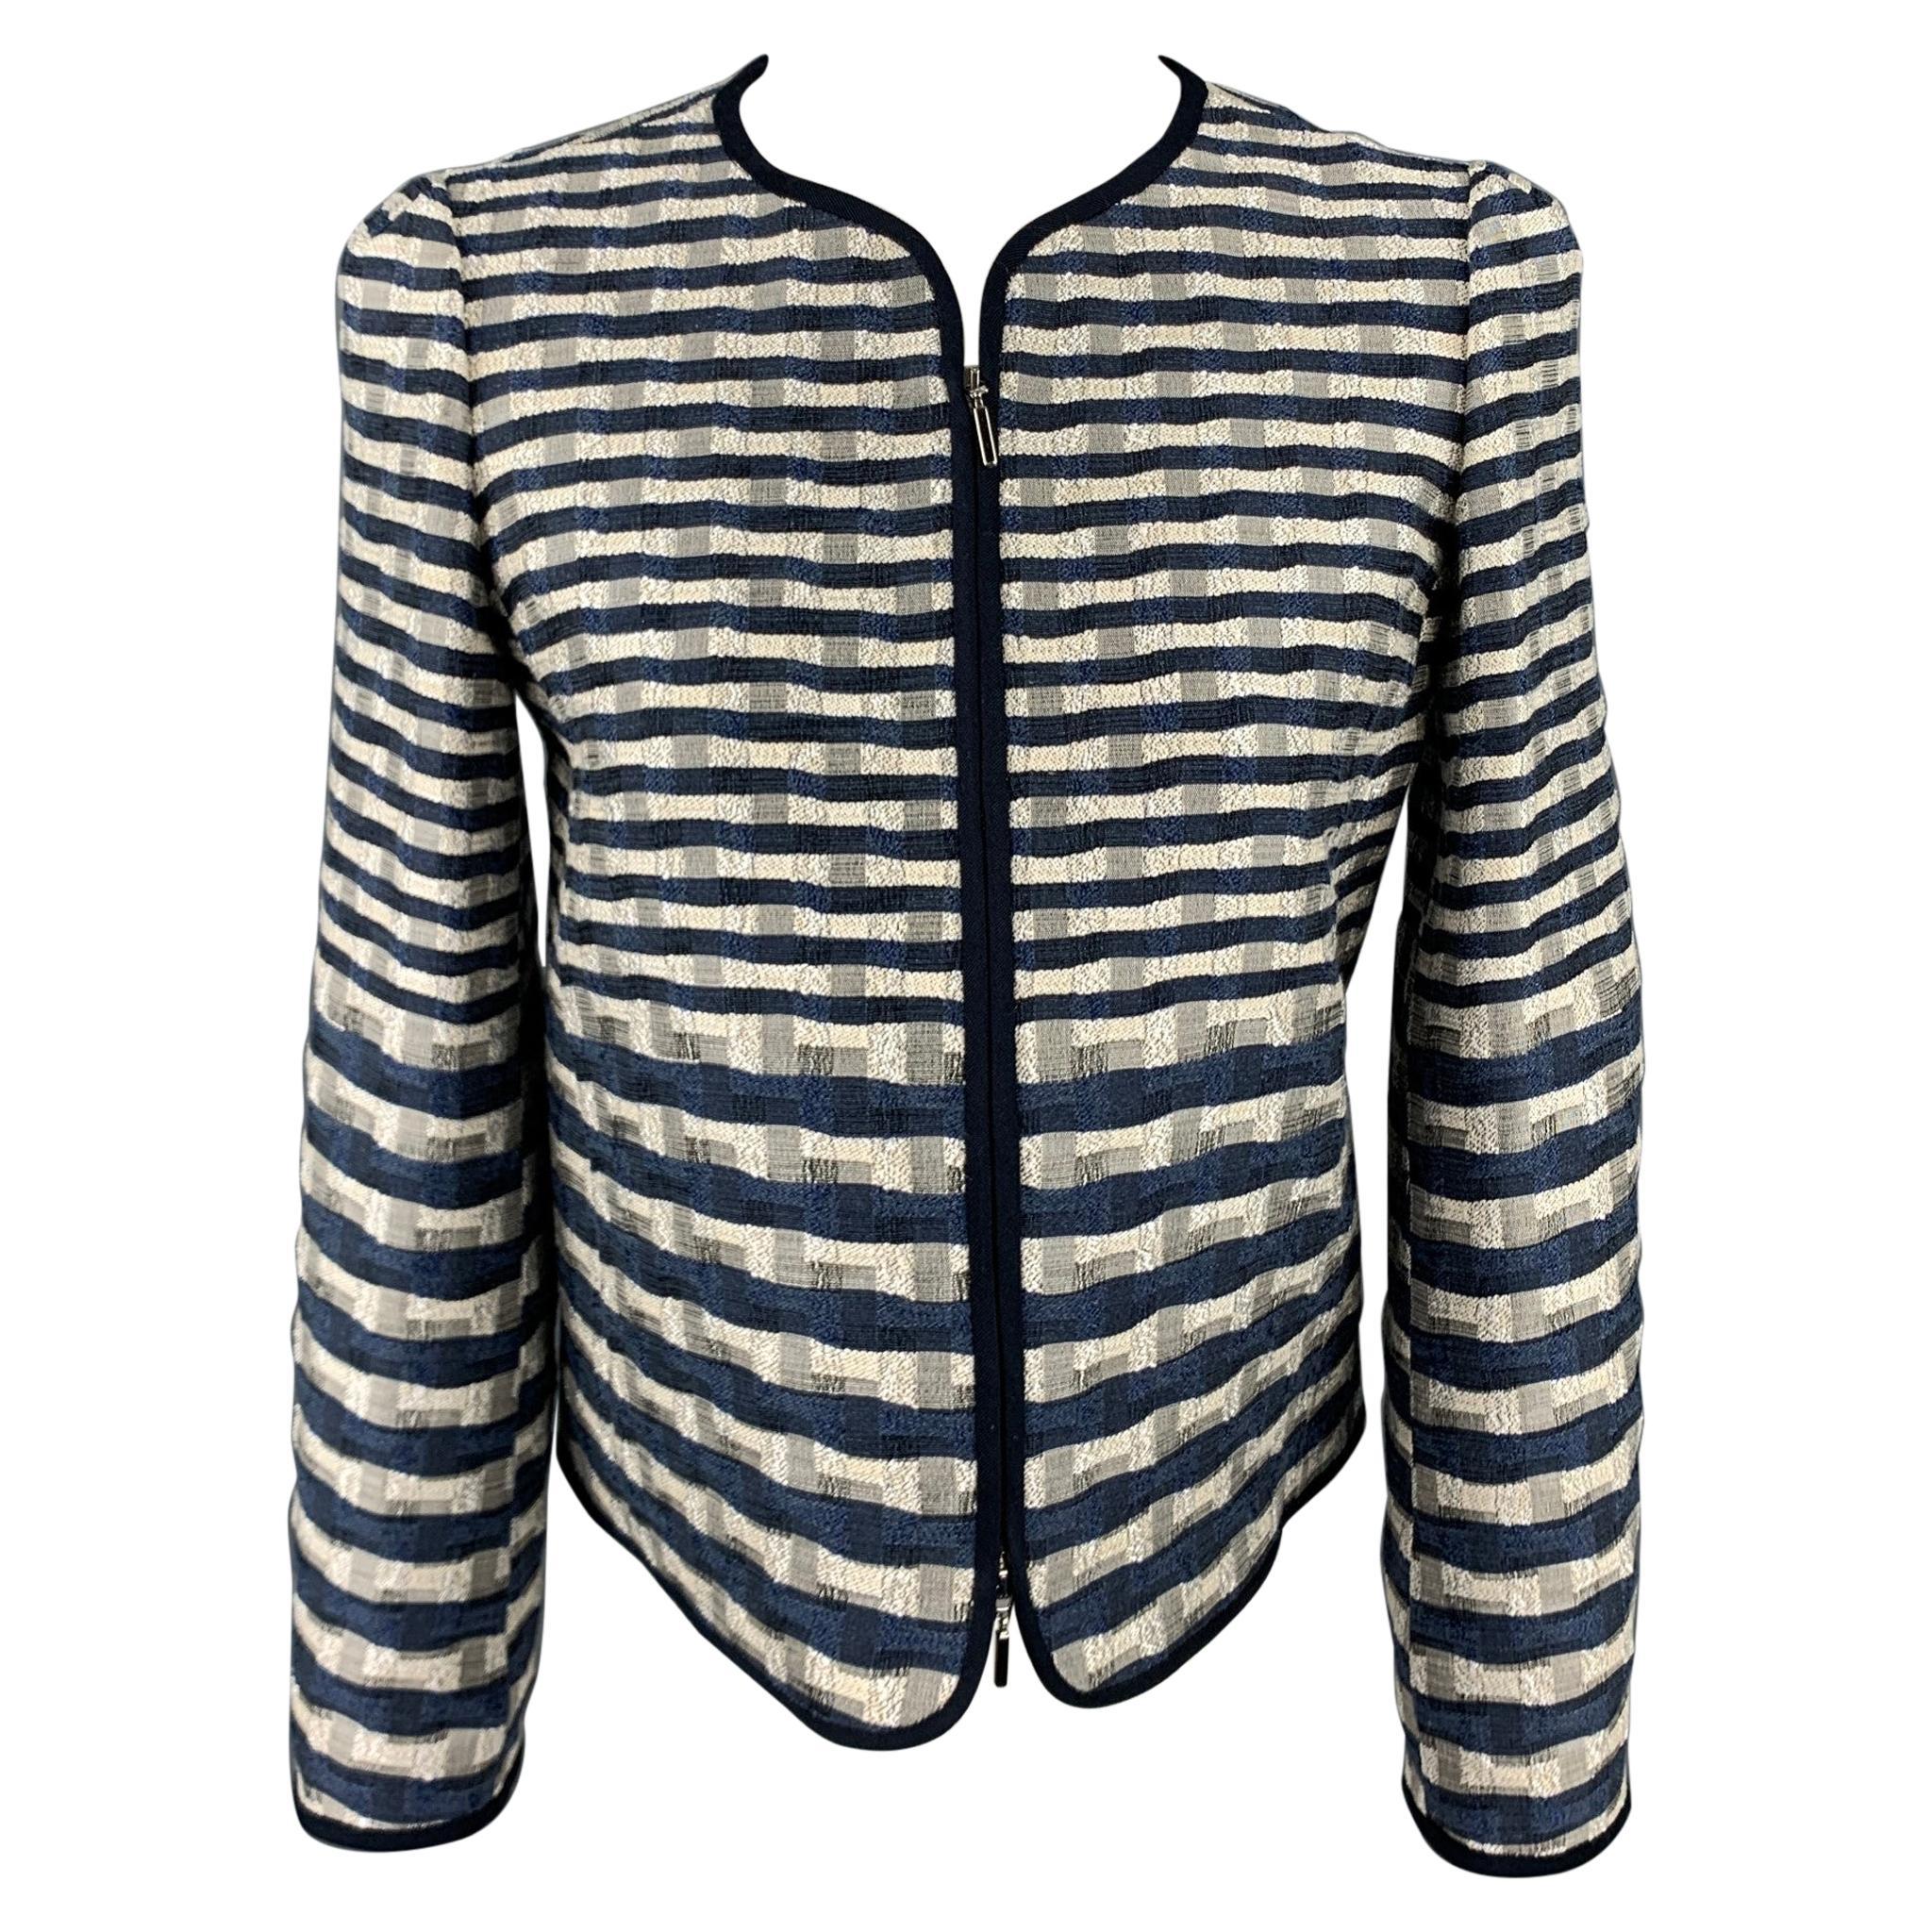 ARMANI COLLEZIONI Size 2 Navy & White Jacquard Jacket